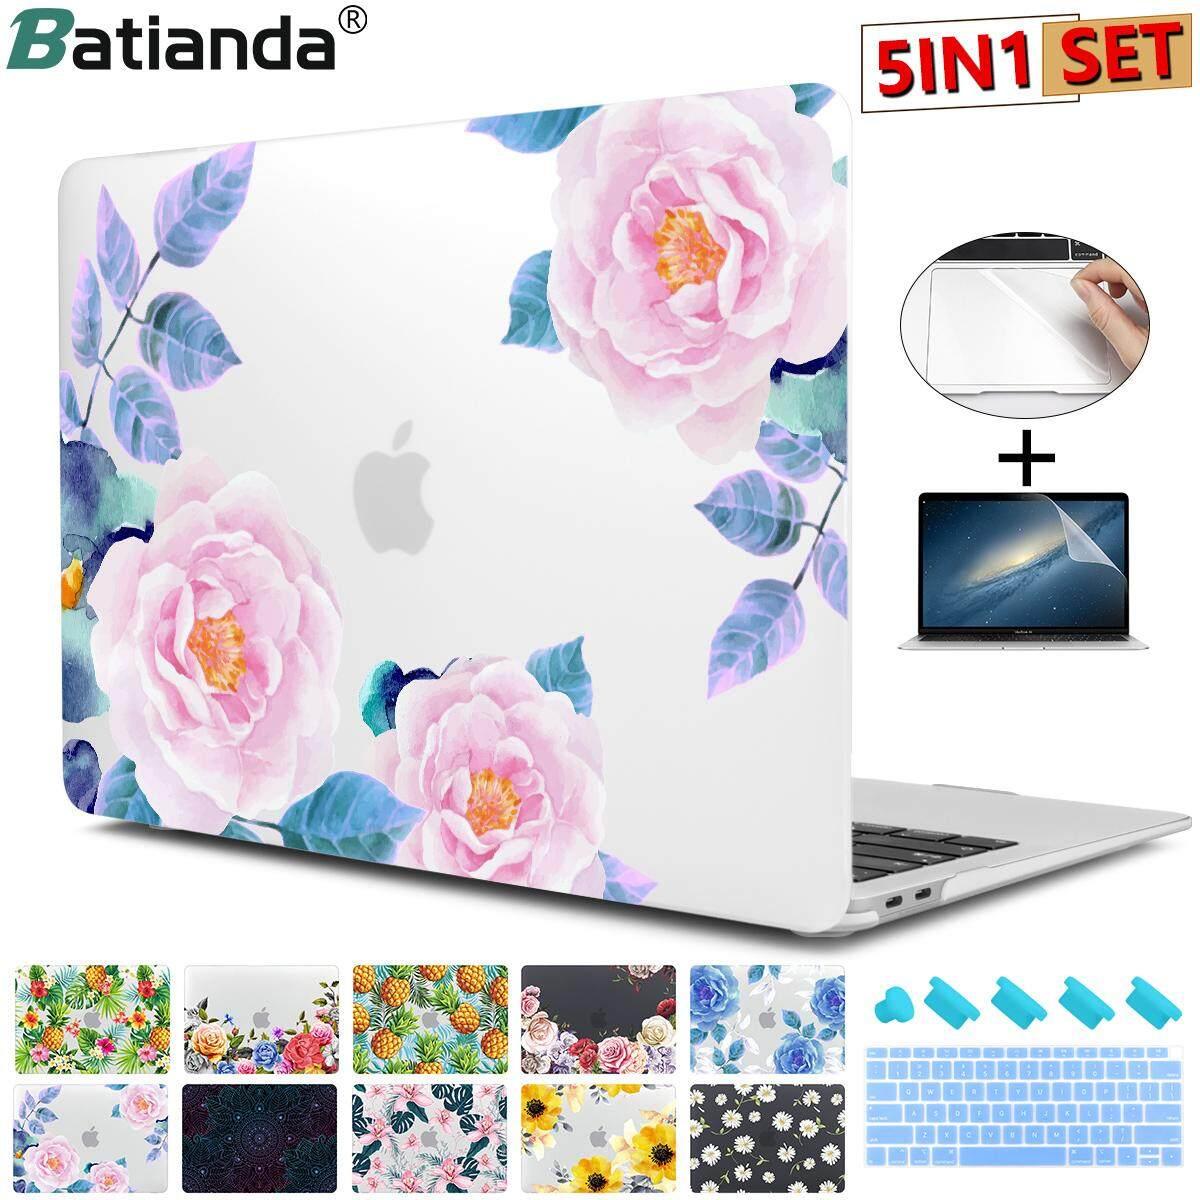 Batianda MacBook Air 13 Inch (A1369/A1466)Case Matte Frosted Hard Shell Cover